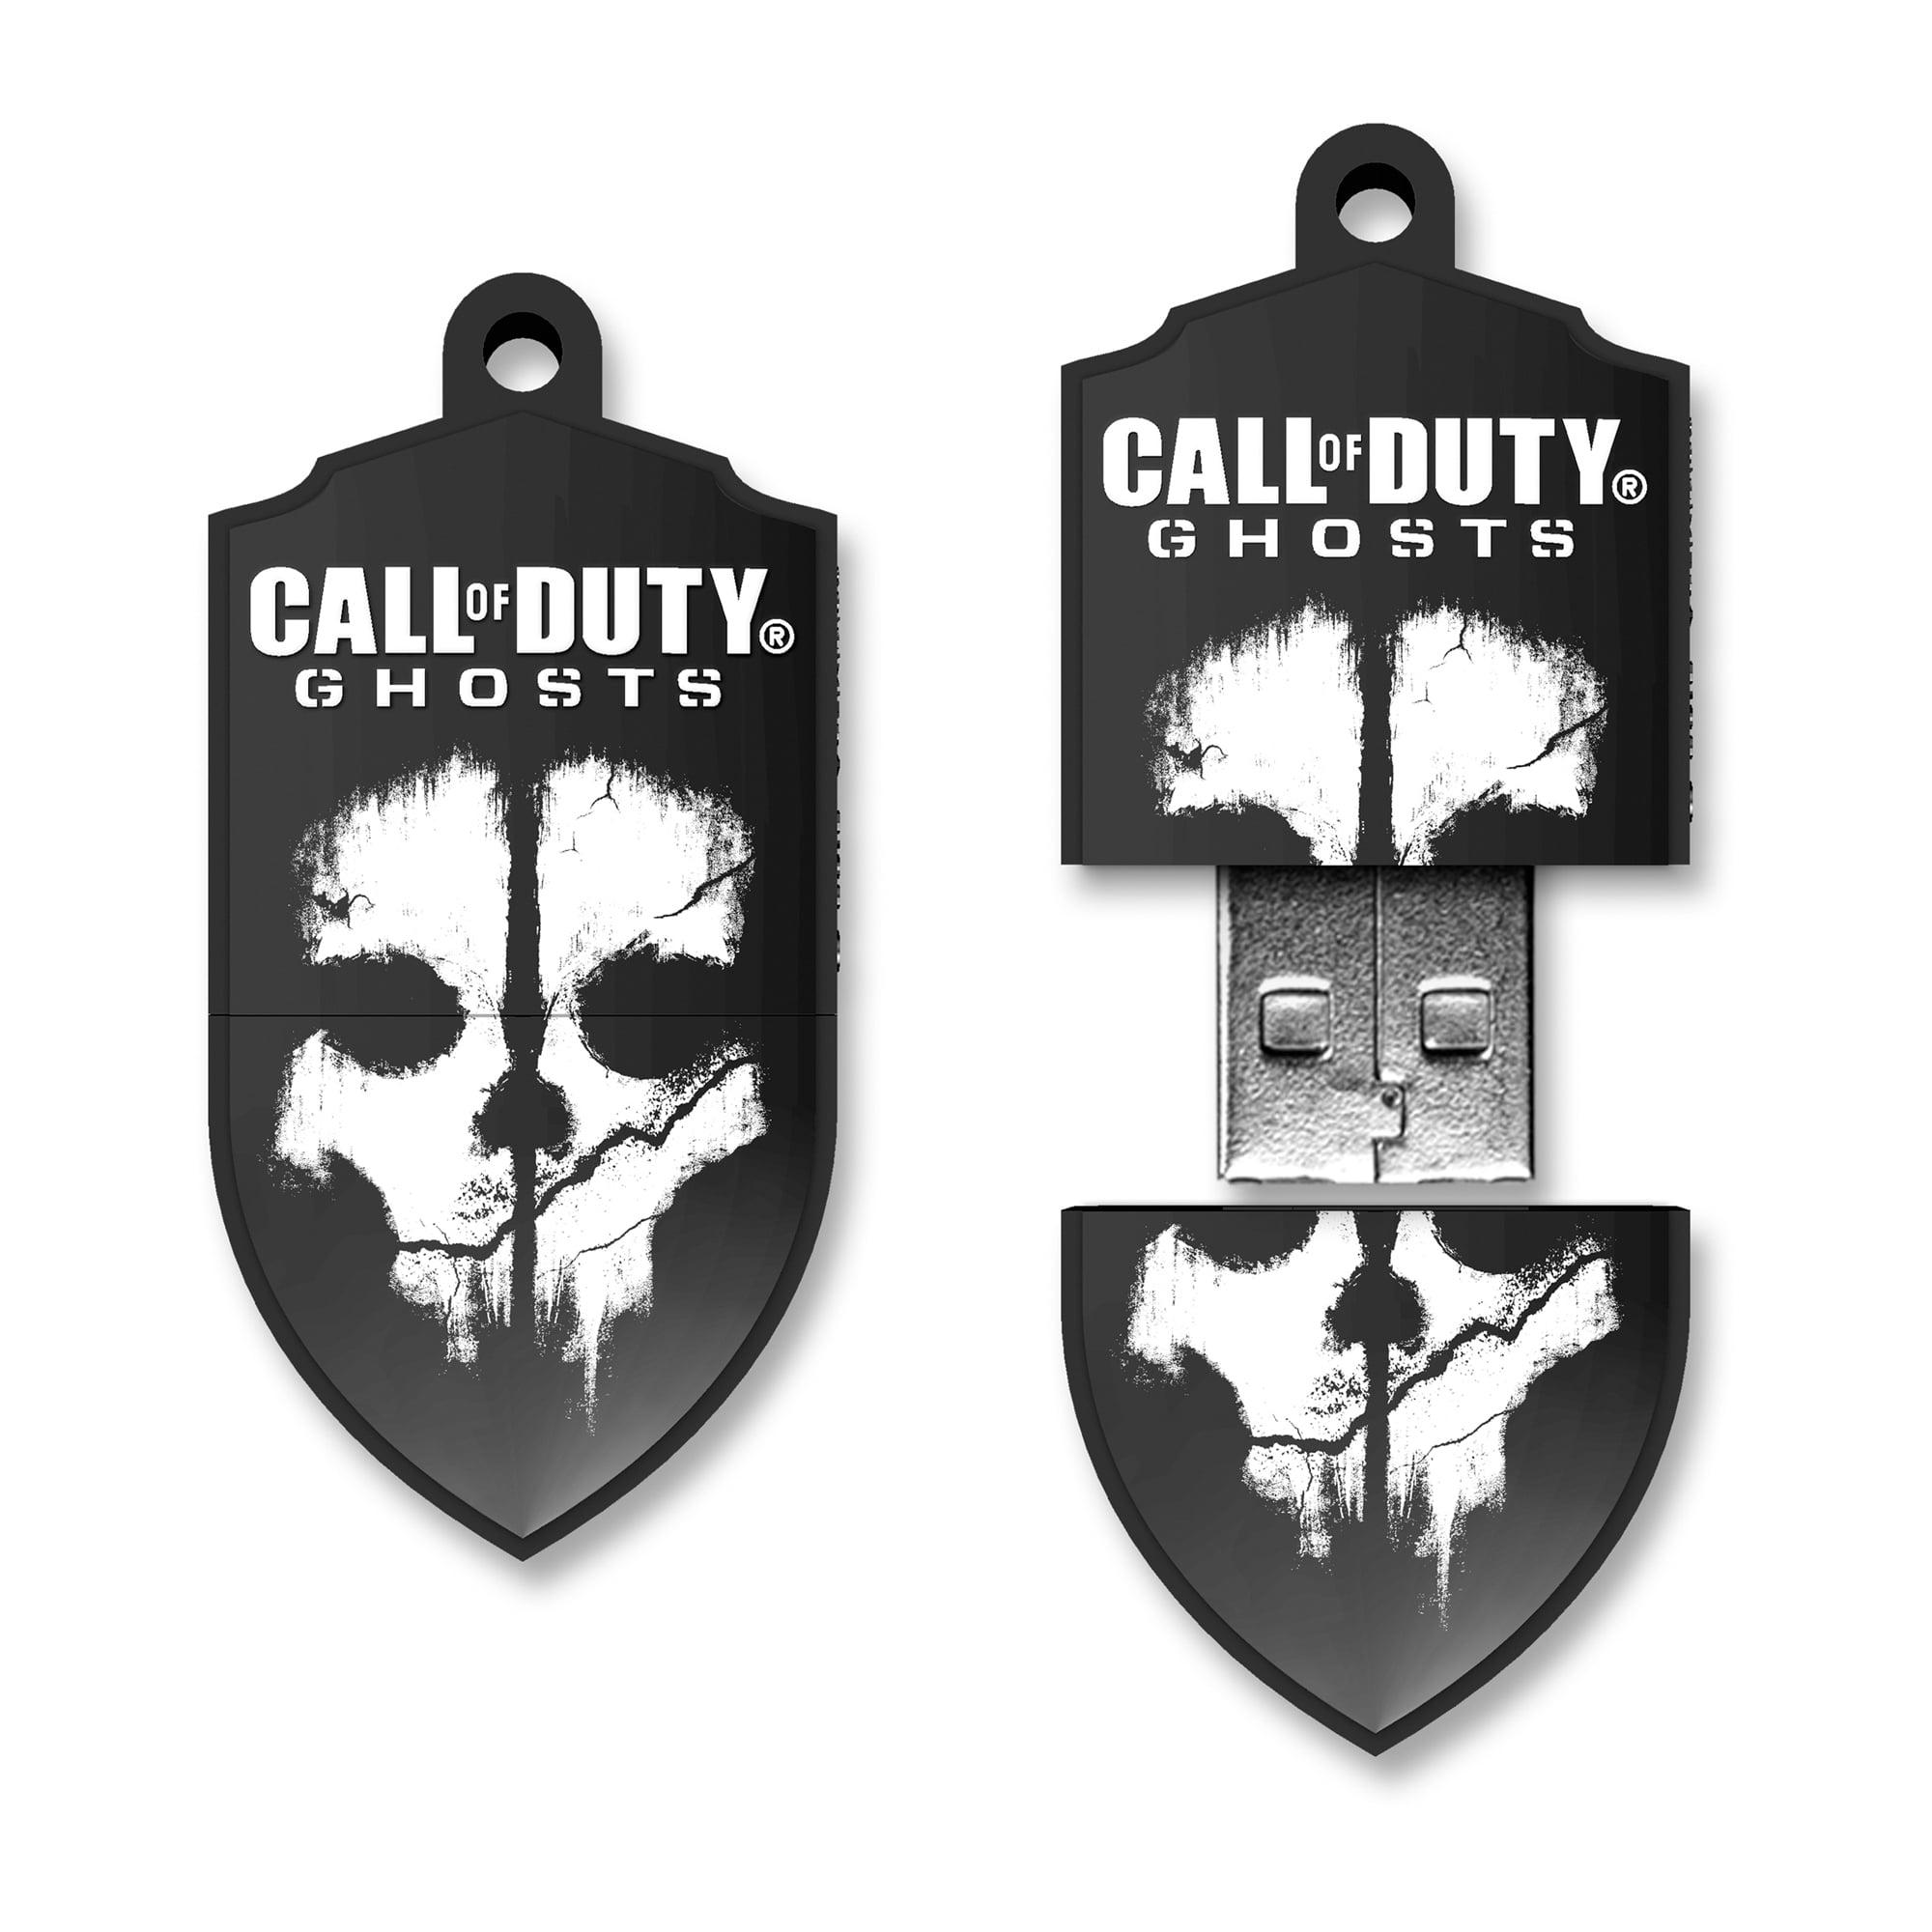 Call Of Duty Ghosts Shield Usb Flash Drive 8gb Walmart